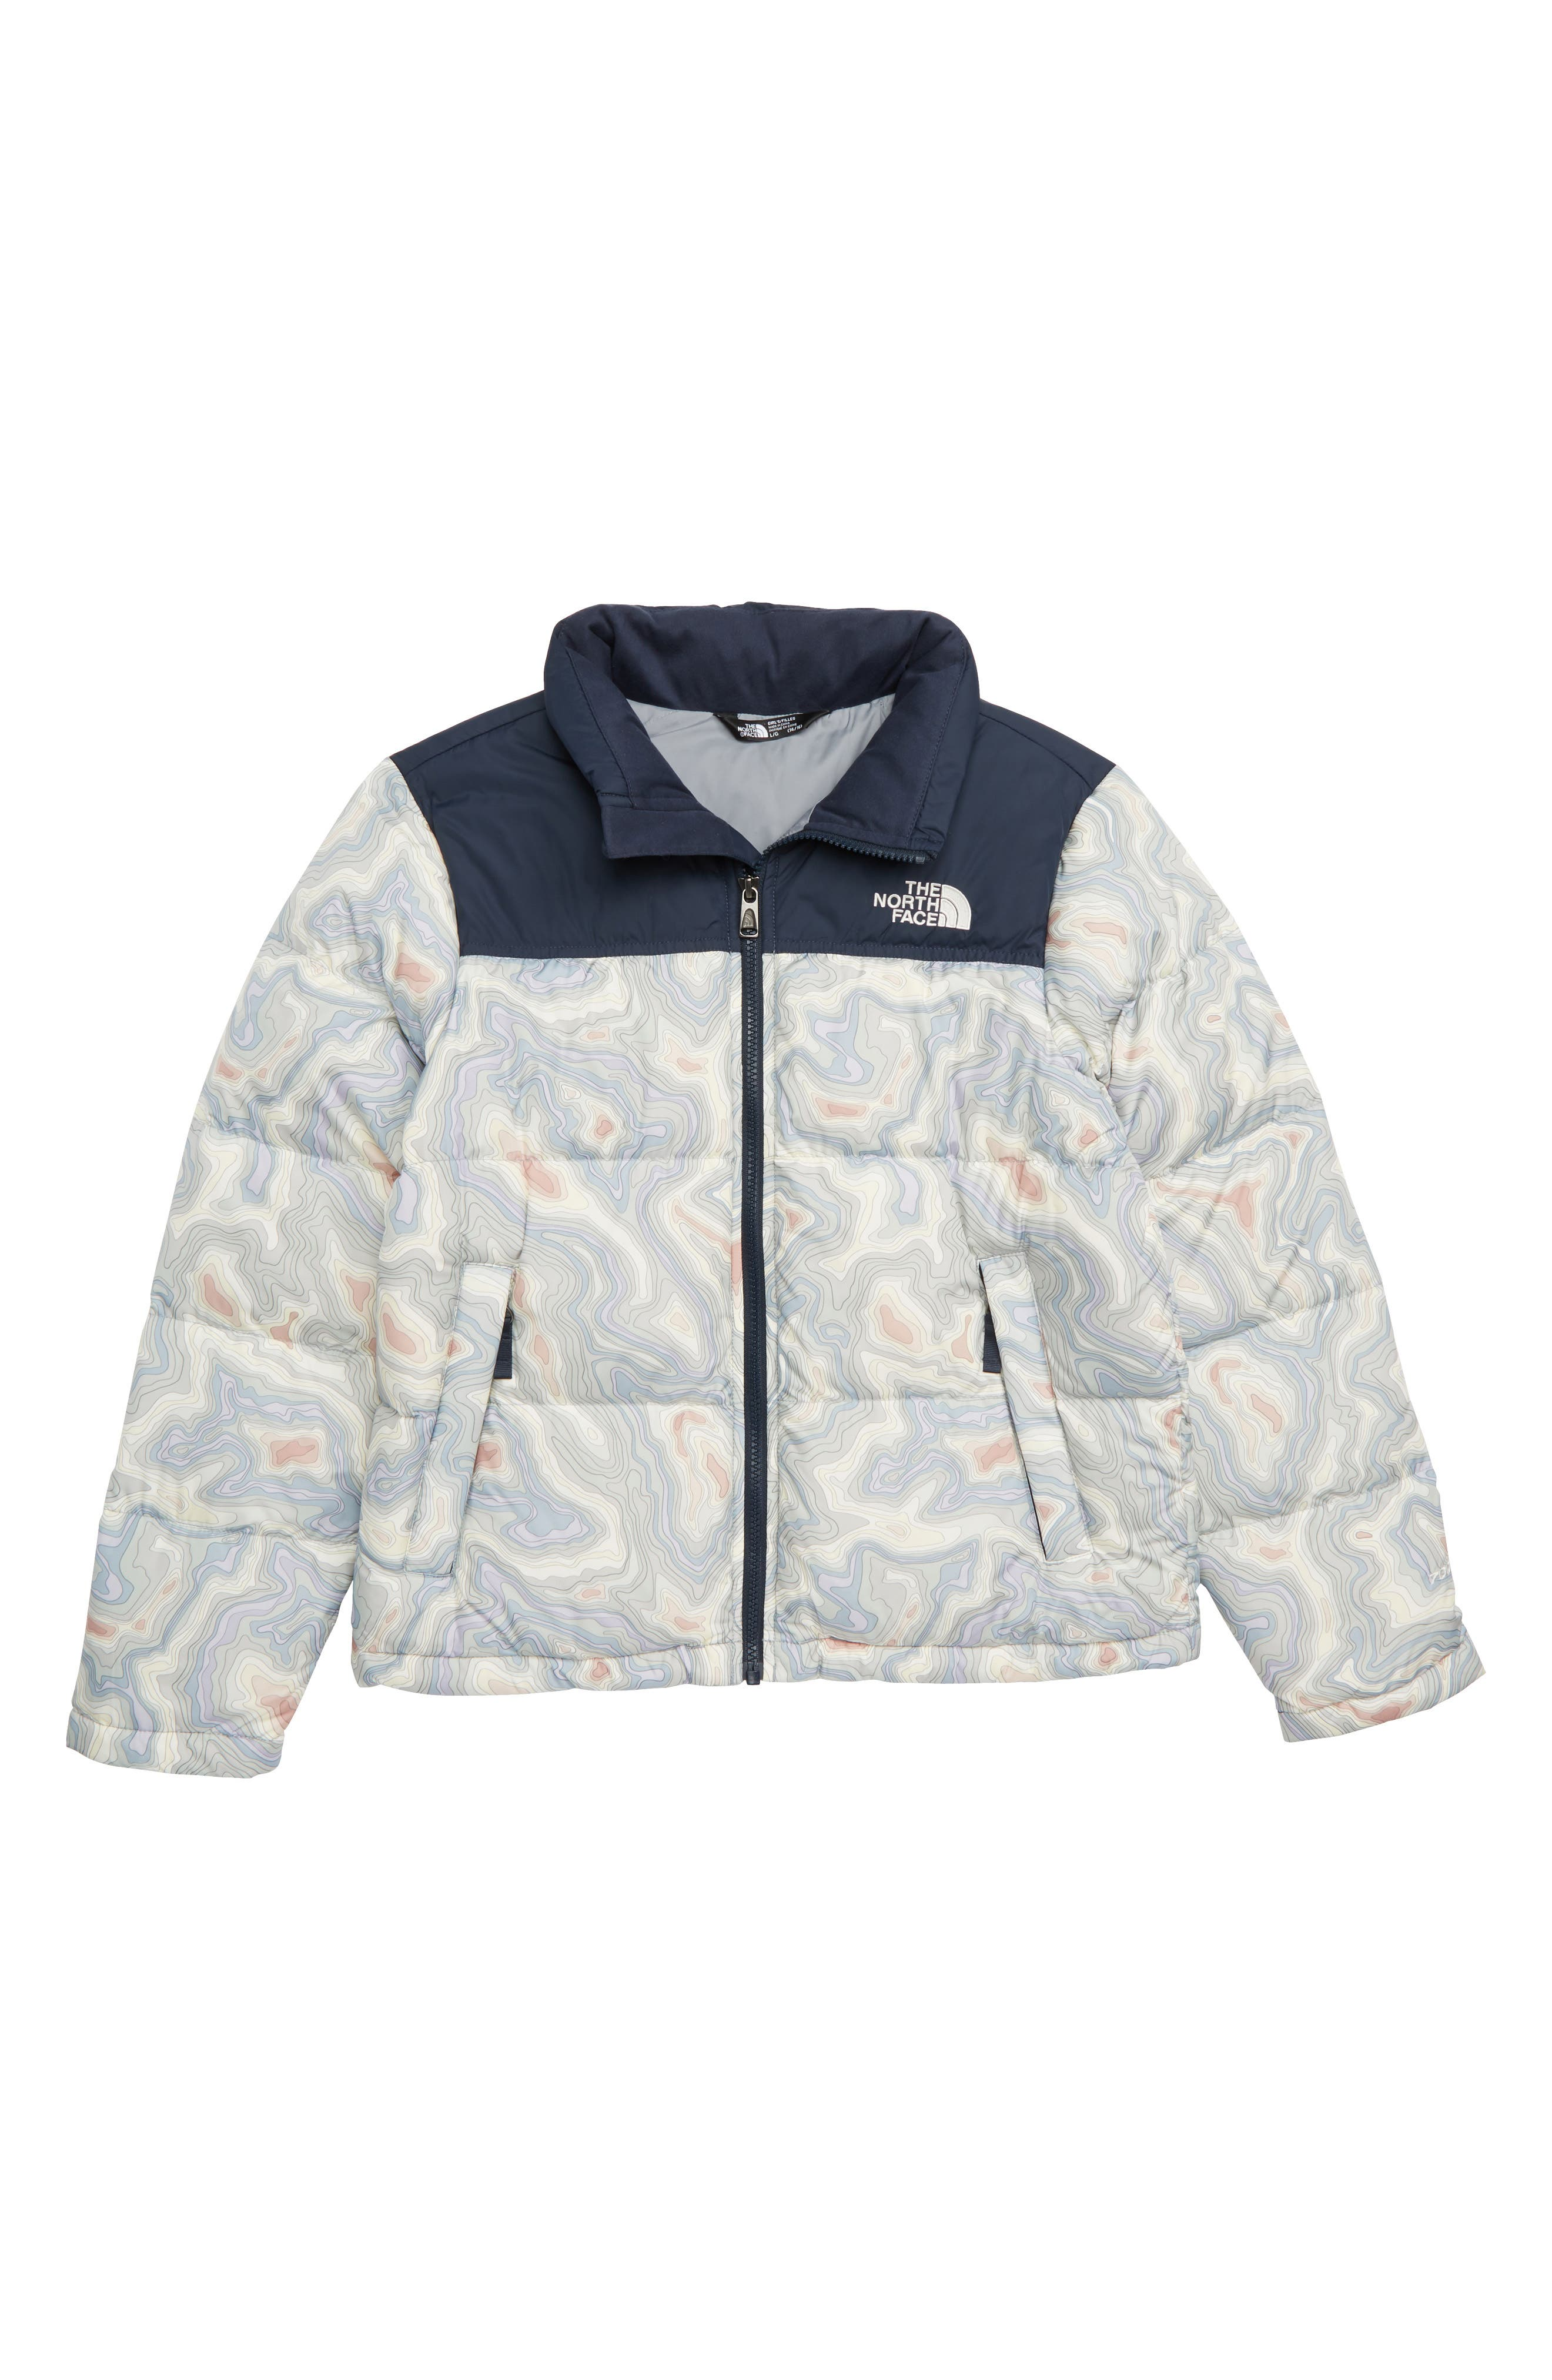 Nuptse 700 Fill Power Down Puffer Jacket,                             Main thumbnail 1, color,                             MULTI TOPO PRINT